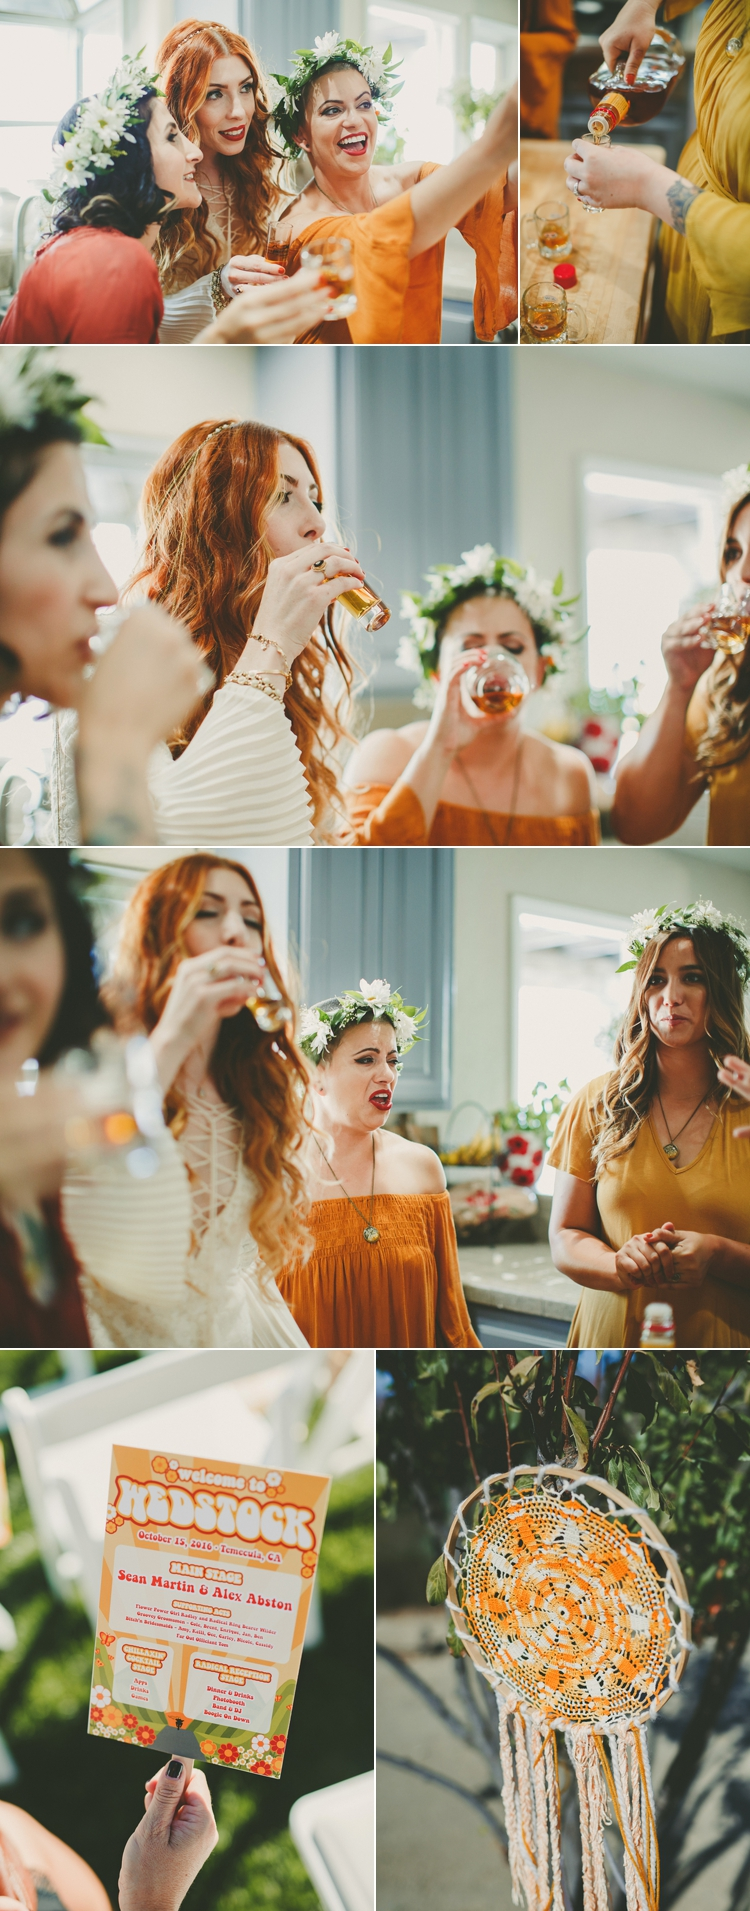 woodstock-inspired-wedding-photos-9